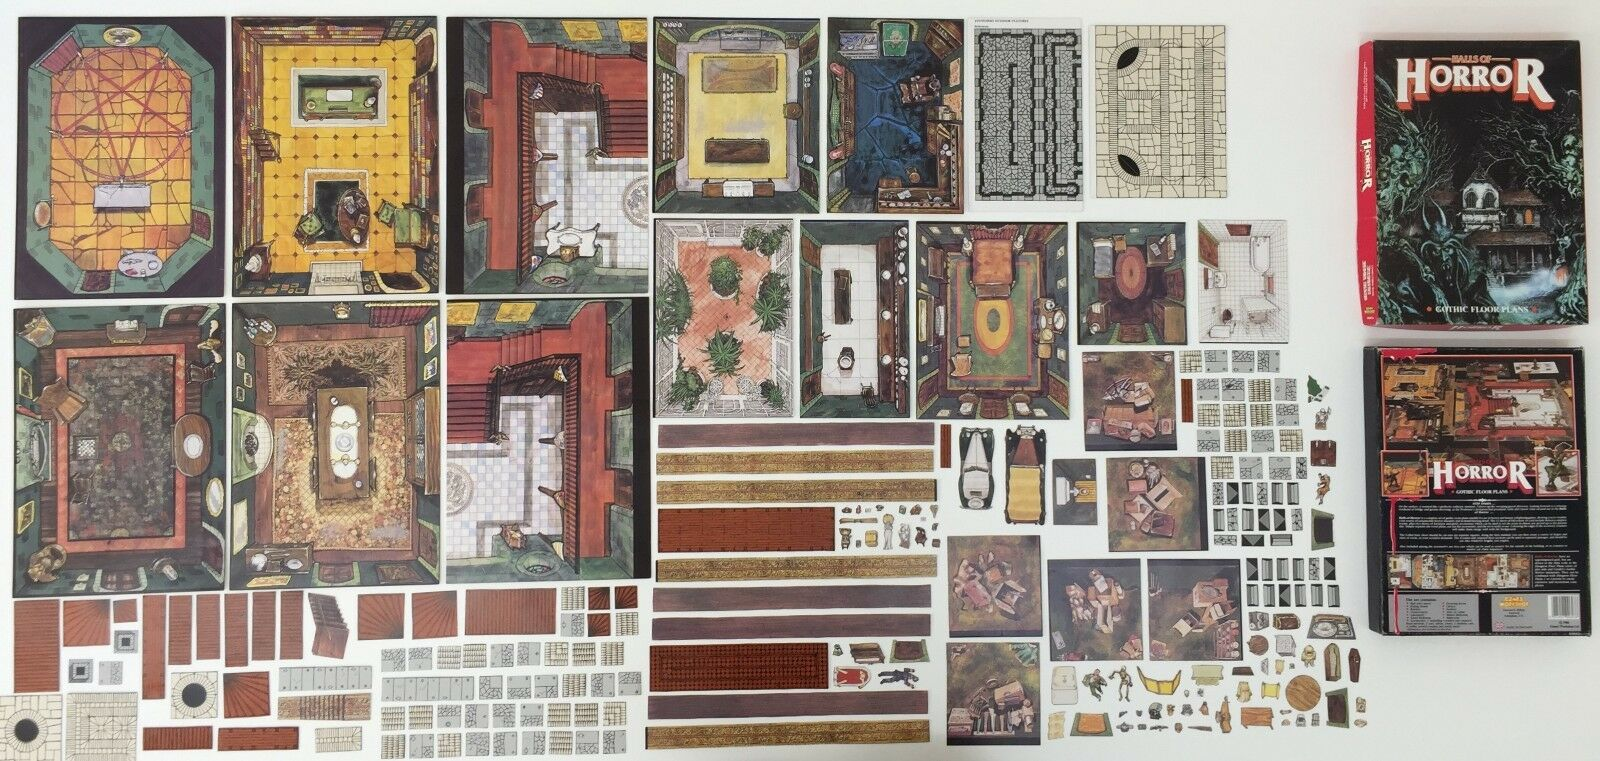 HALL OF HORRORS GOTHIC FLOOR PLANS RAVENLOFT D&D WFRP GAMES WORKSHOP (1986)